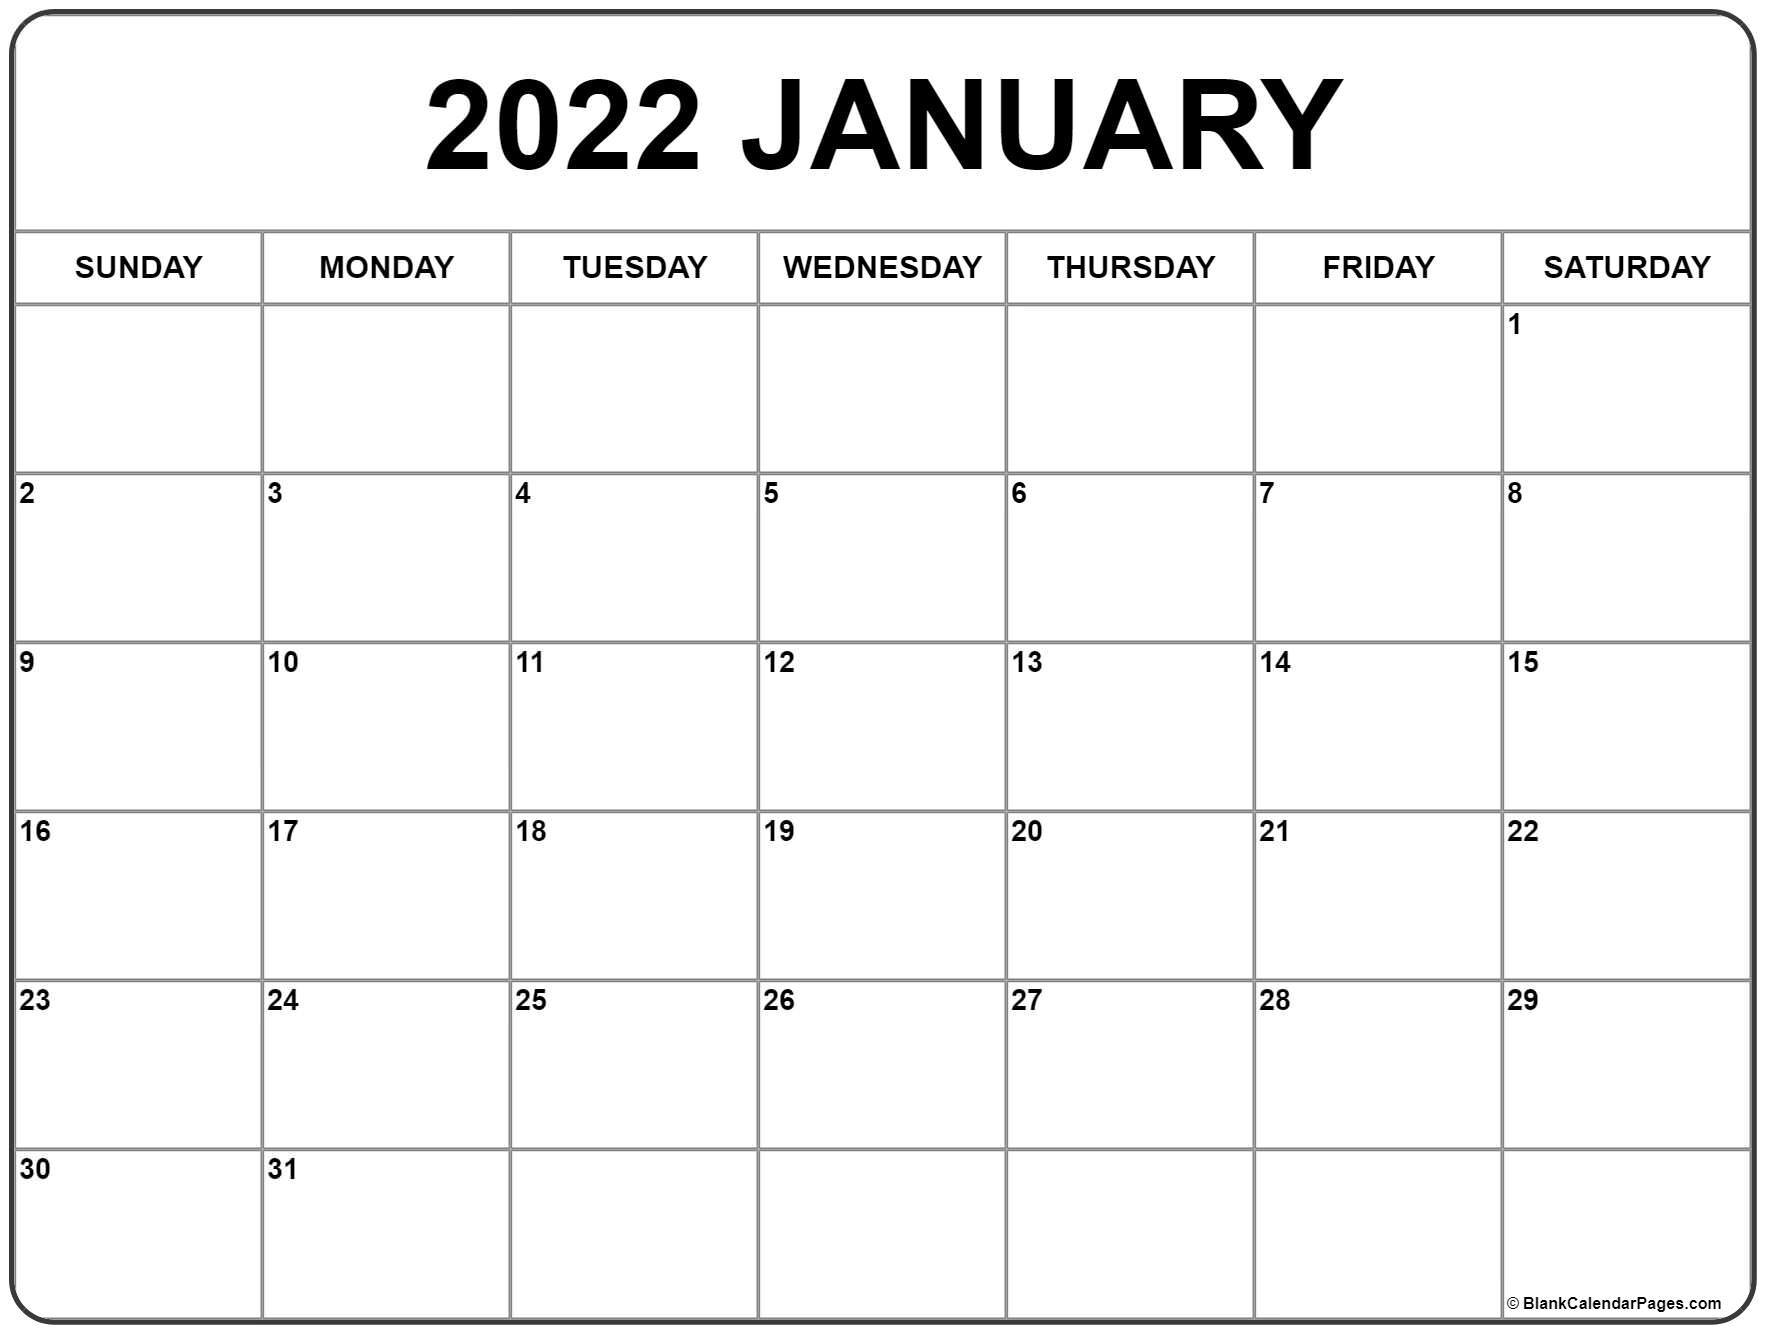 Printable Blank Calendar 2022.Mateo Pedersen Blank January 2022 Calendar Printable